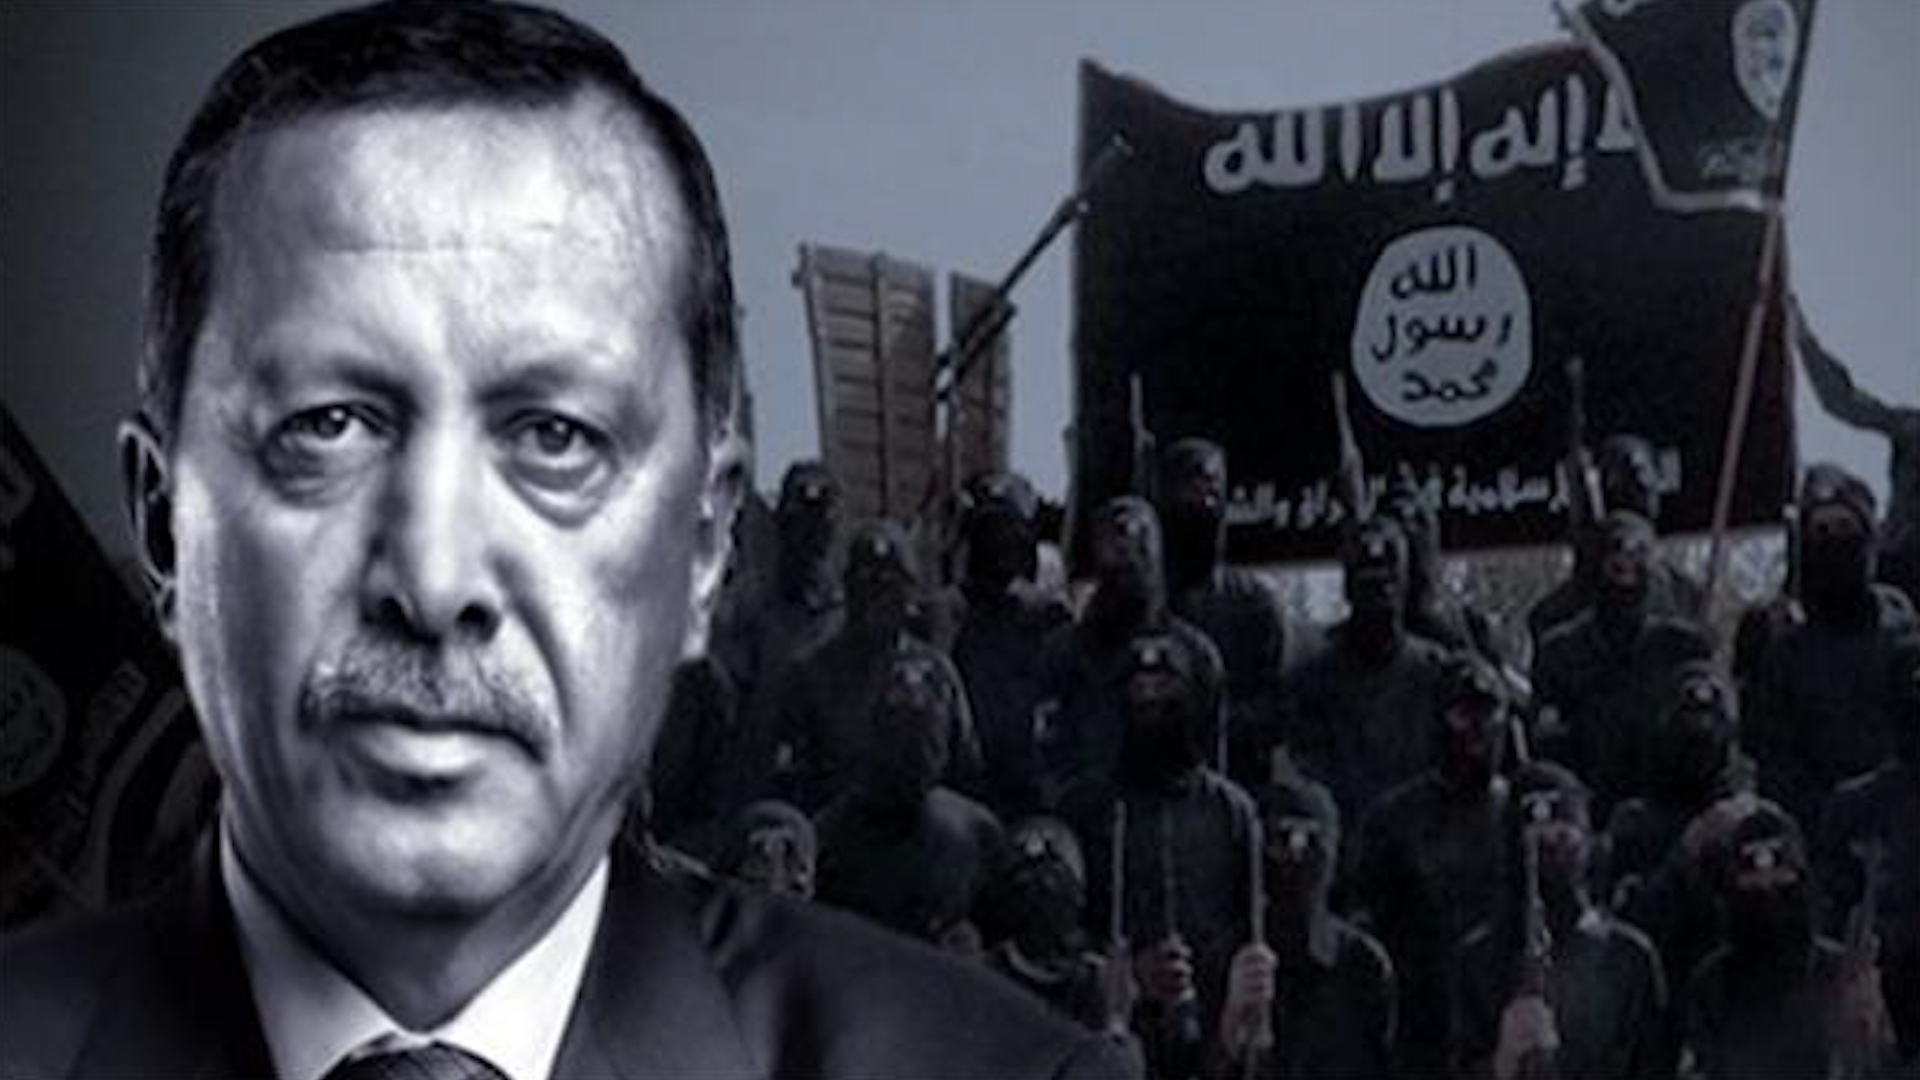 Photo of صحيفة: سعي واشنطن لإرضاء أنقرة التي تحارب الكرد ستجعلنا نندم كثيراً